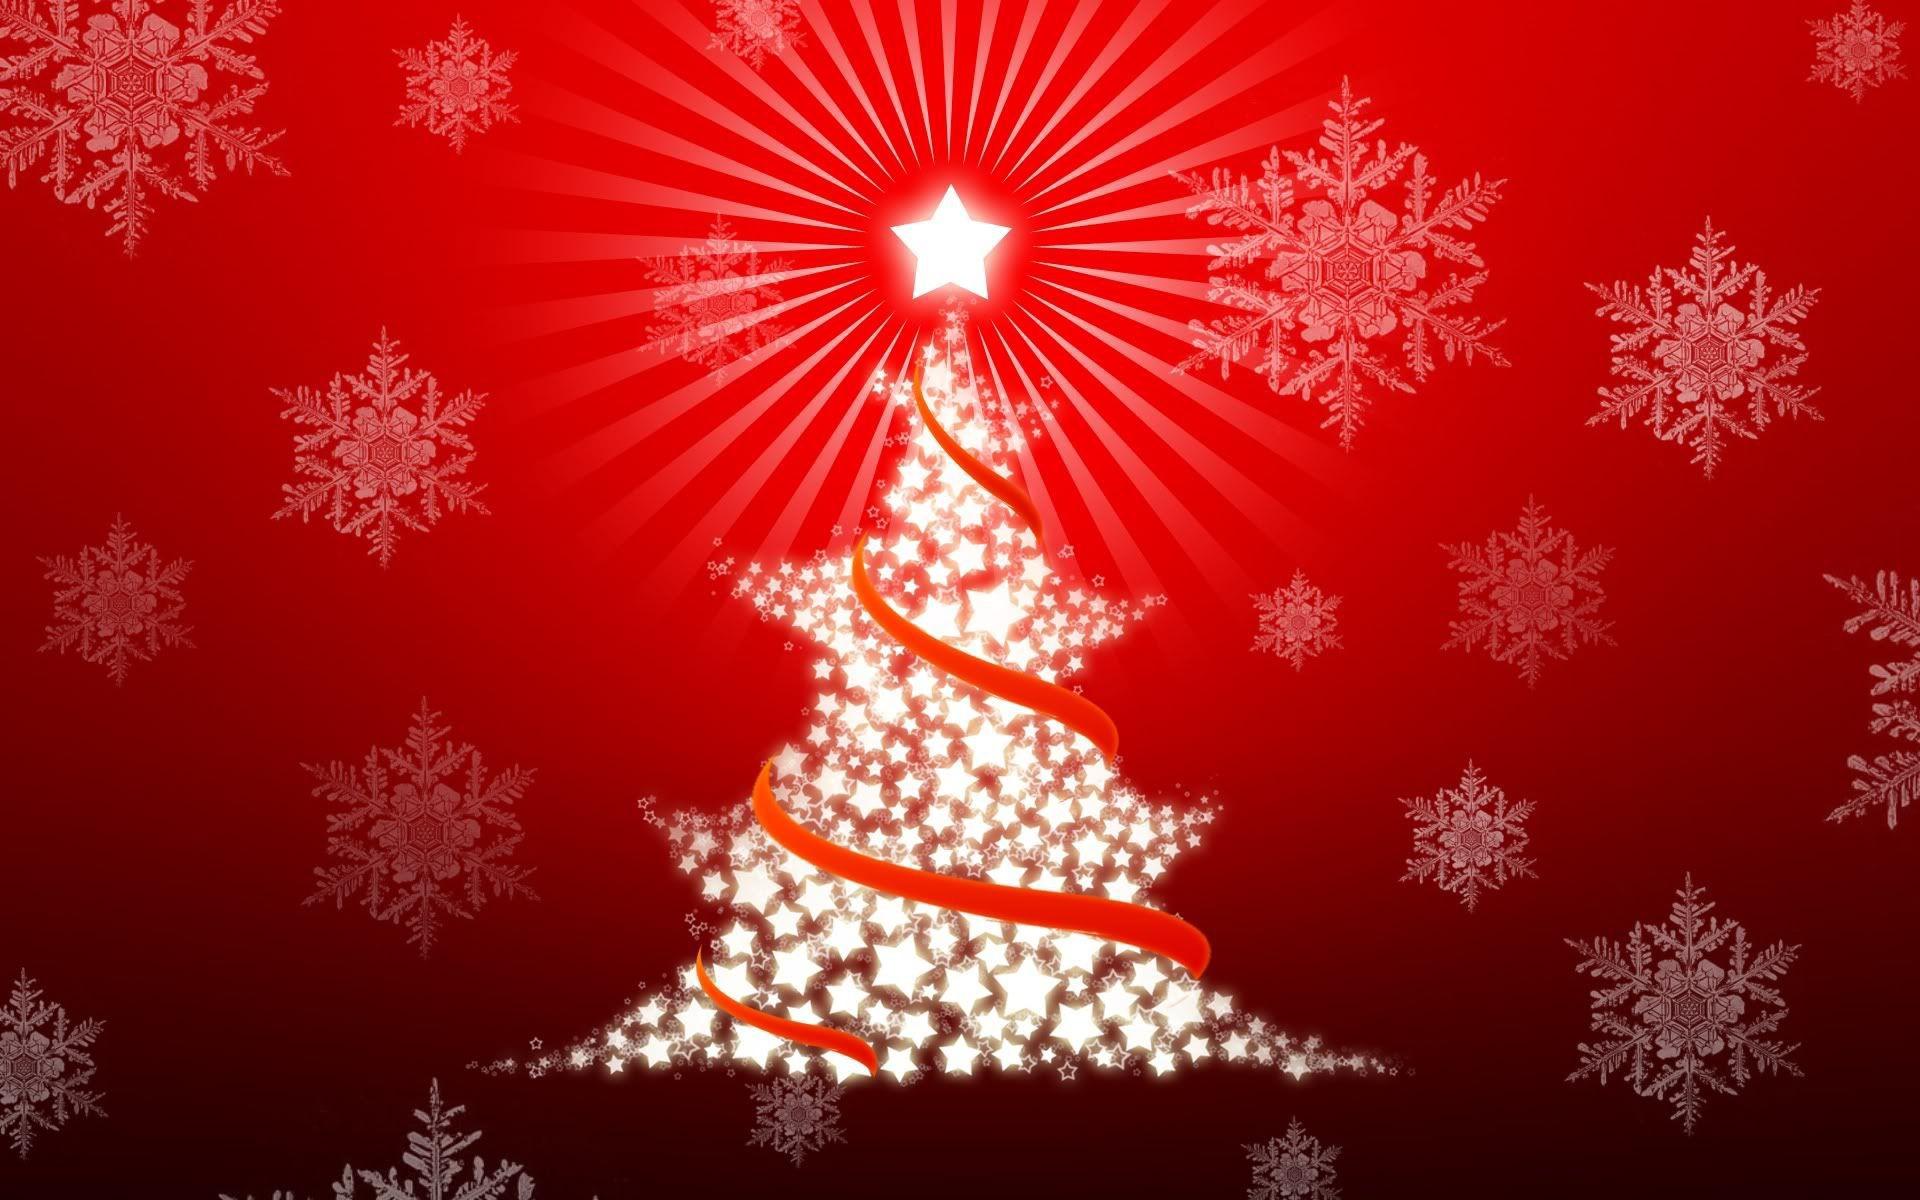 … christmas-tree-wallpaper-hd-06 …